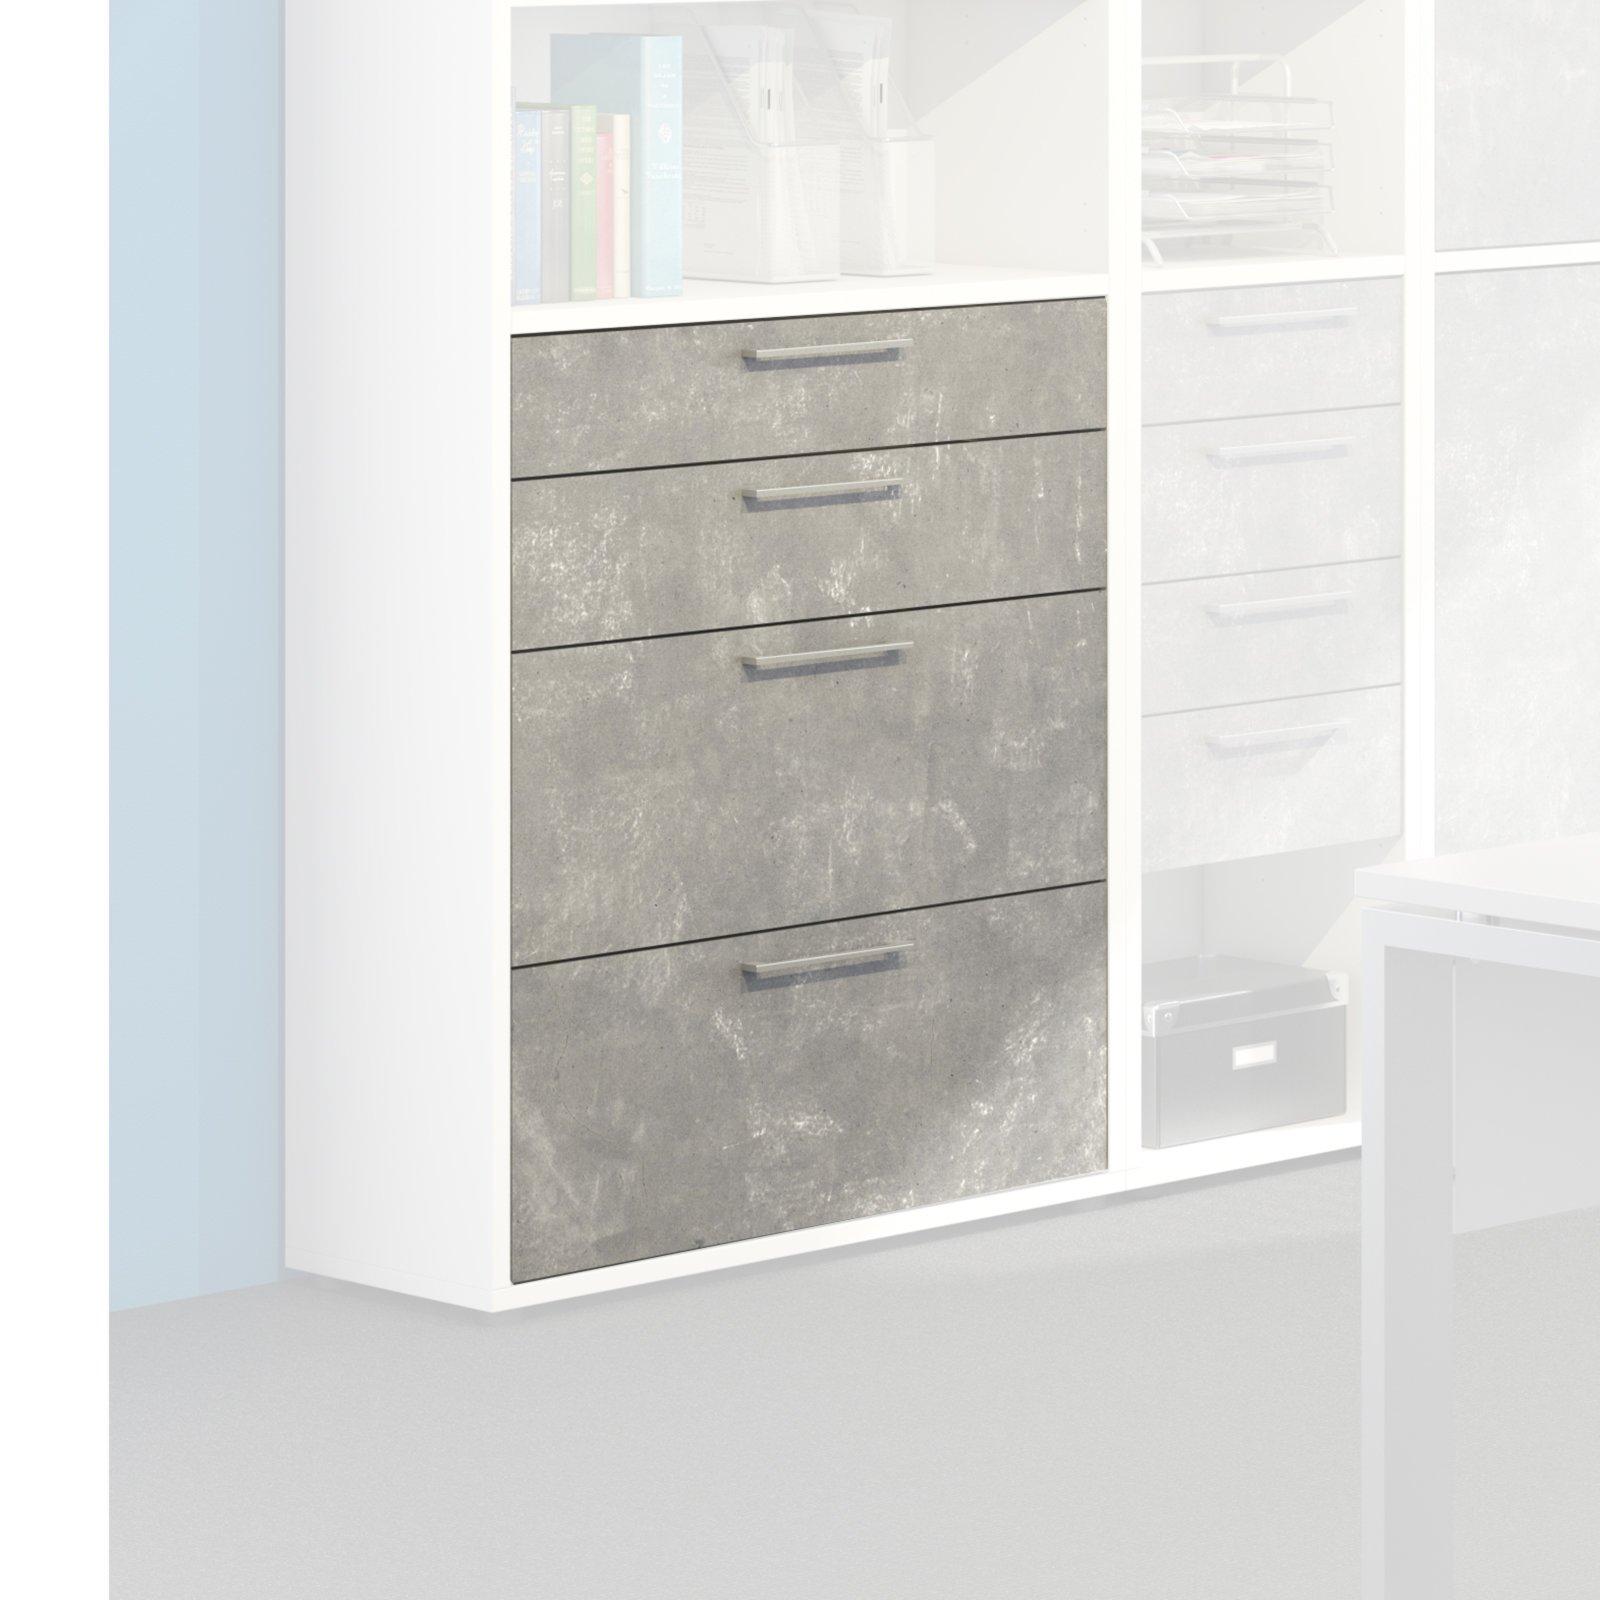 schubladen set contact betonoptik 84 cm b roprogramm contact b roprogramme. Black Bedroom Furniture Sets. Home Design Ideas